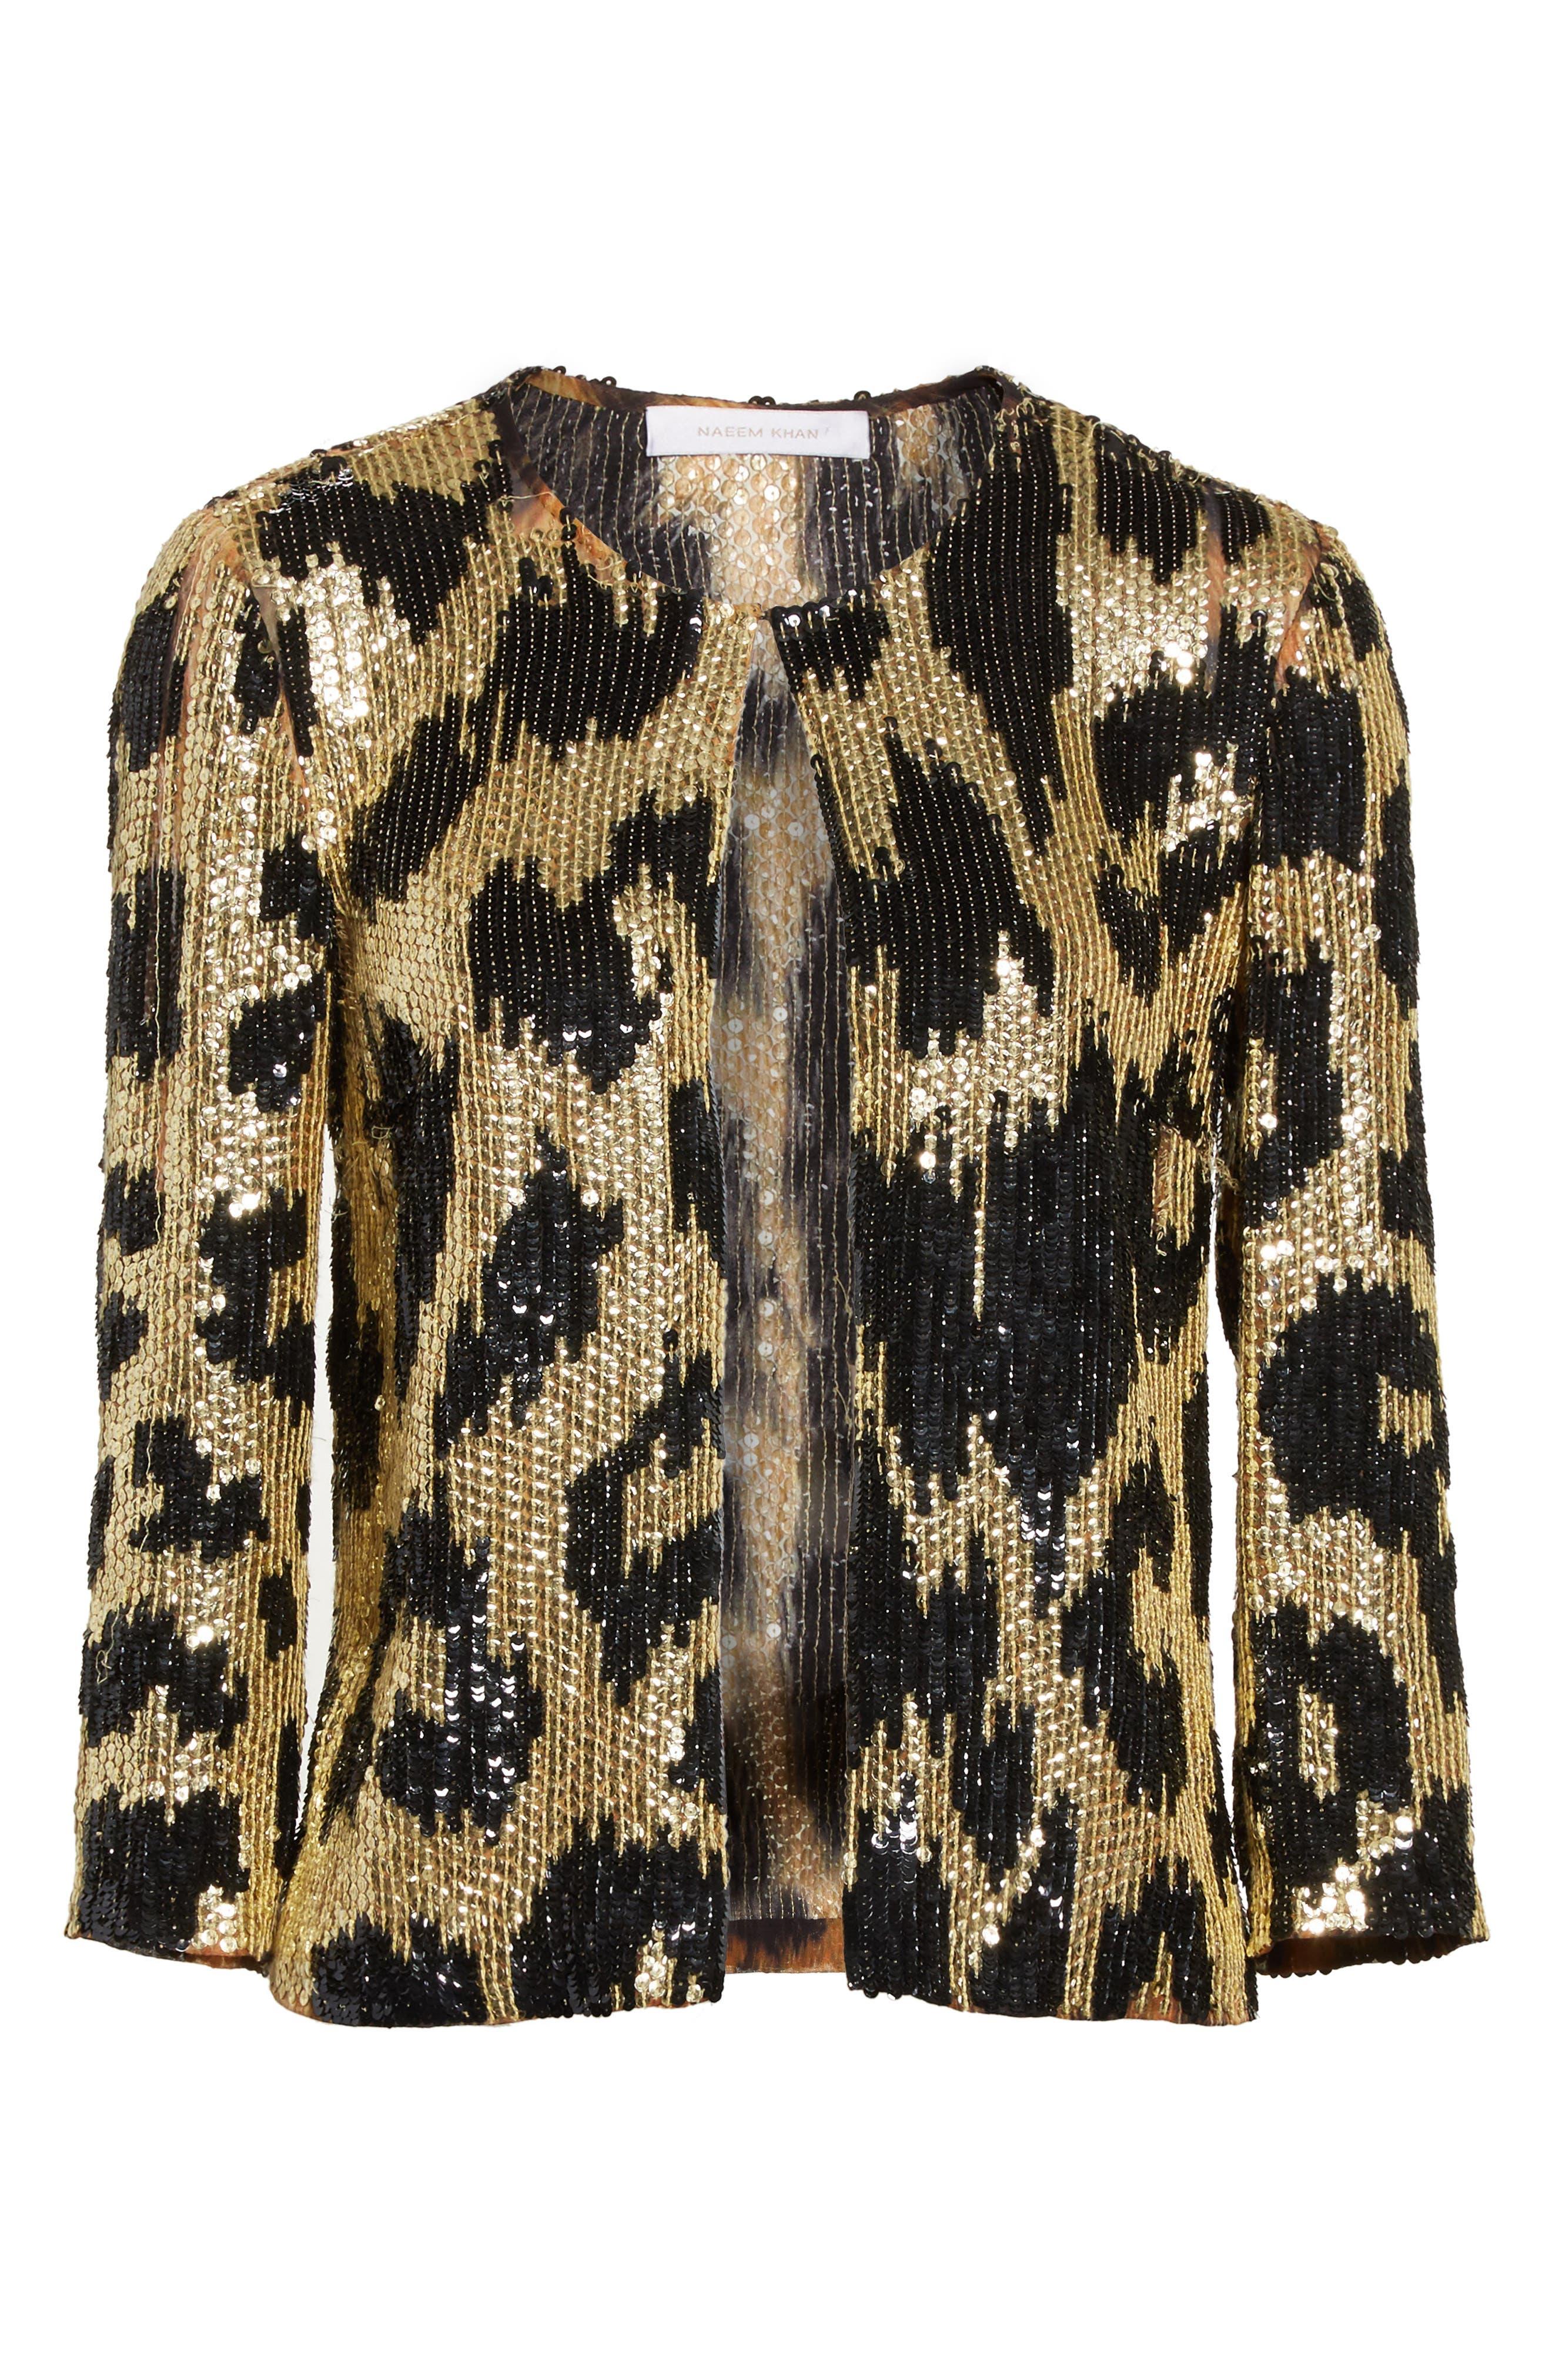 Cheetah Print Sequin Jacket,                             Alternate thumbnail 5, color,                             710